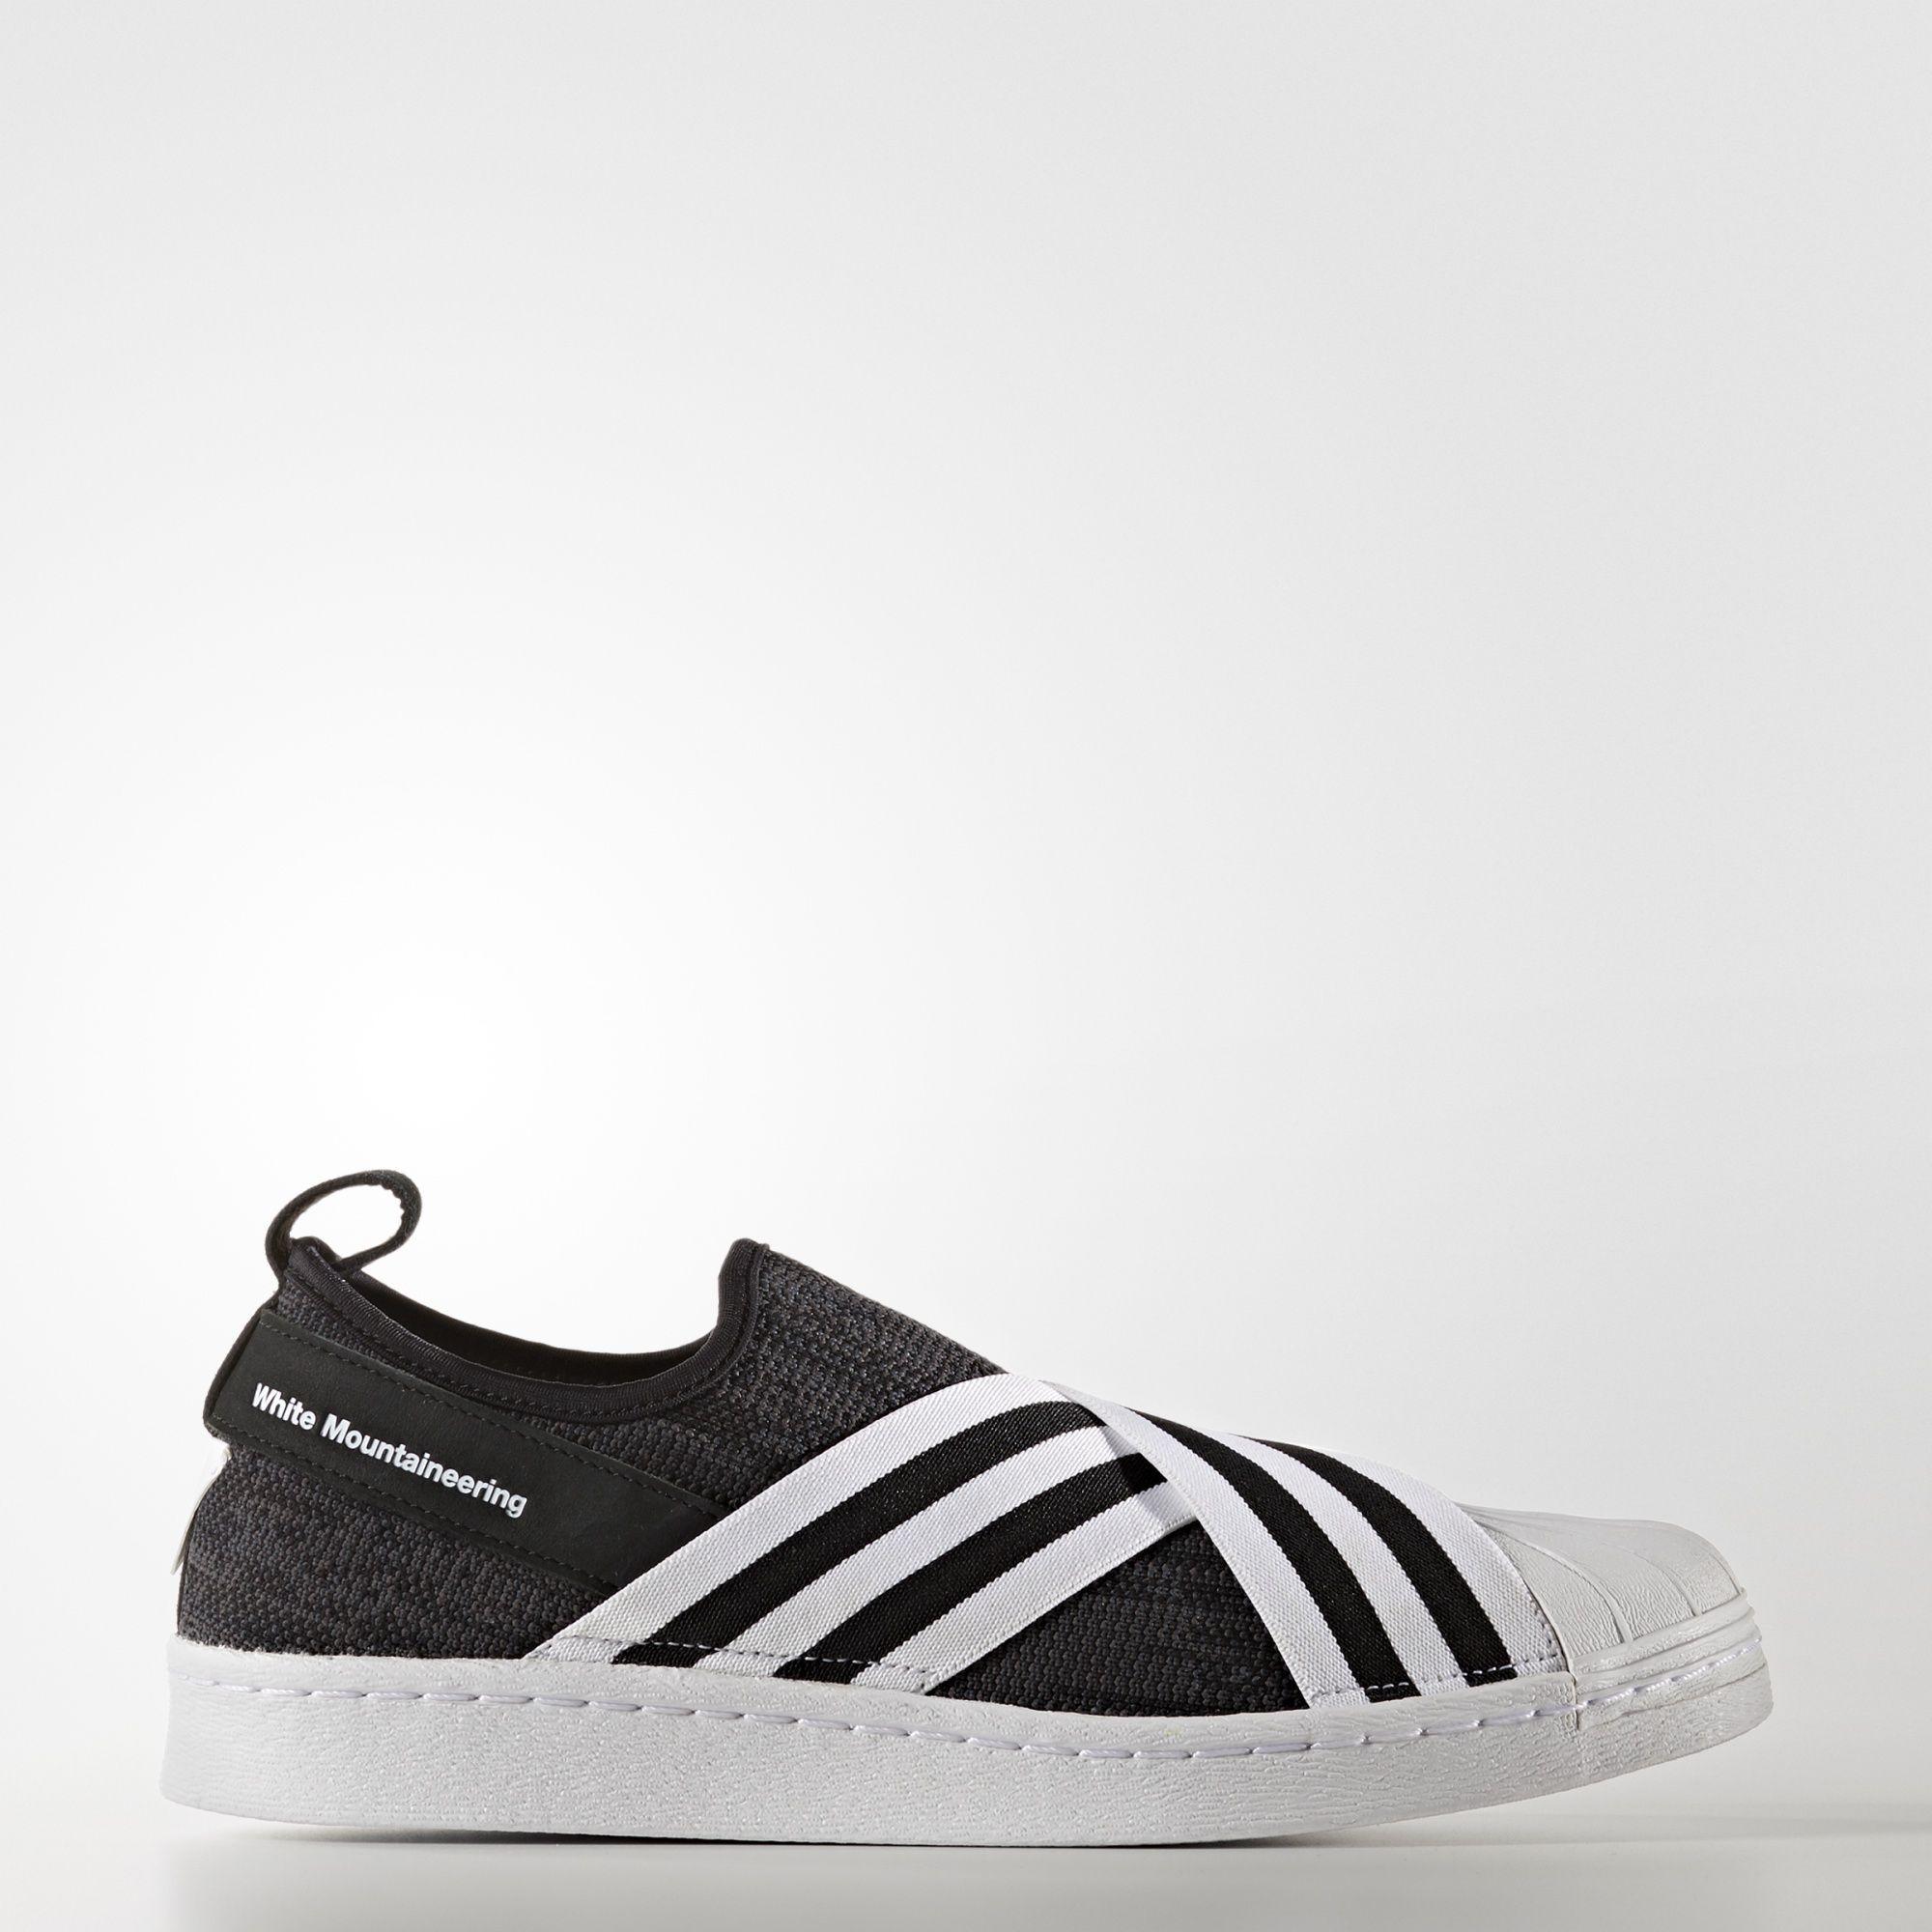 Primeknit Schuh Superstar White Slip Adidas On Mountaineering A435RLj